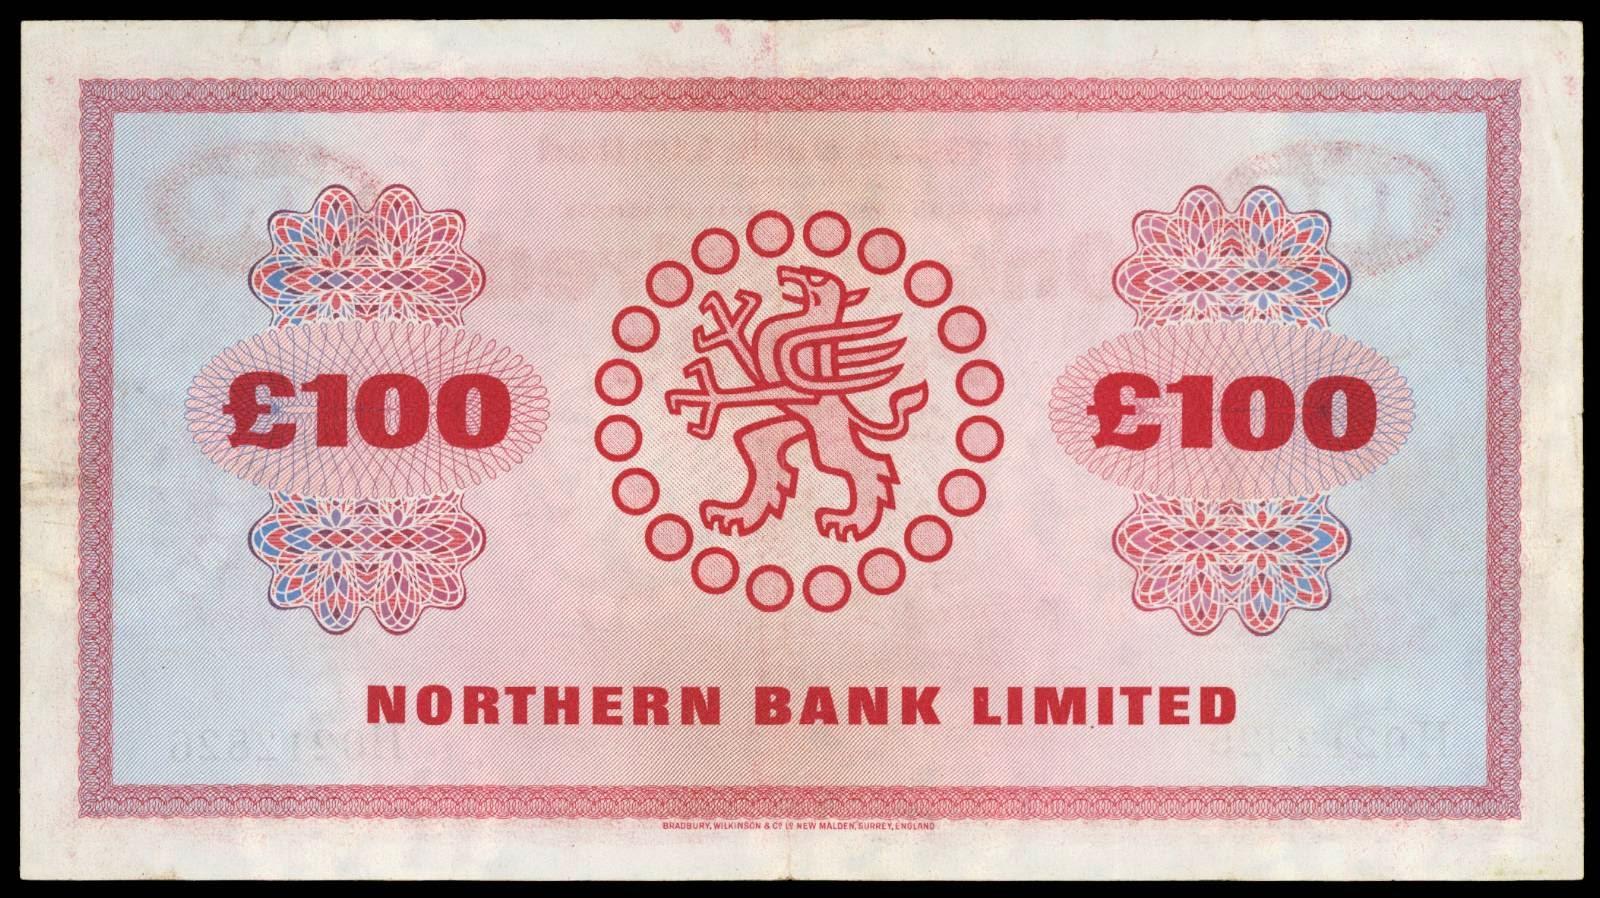 100 pound note 1978 northern bank limitedworld banknotes